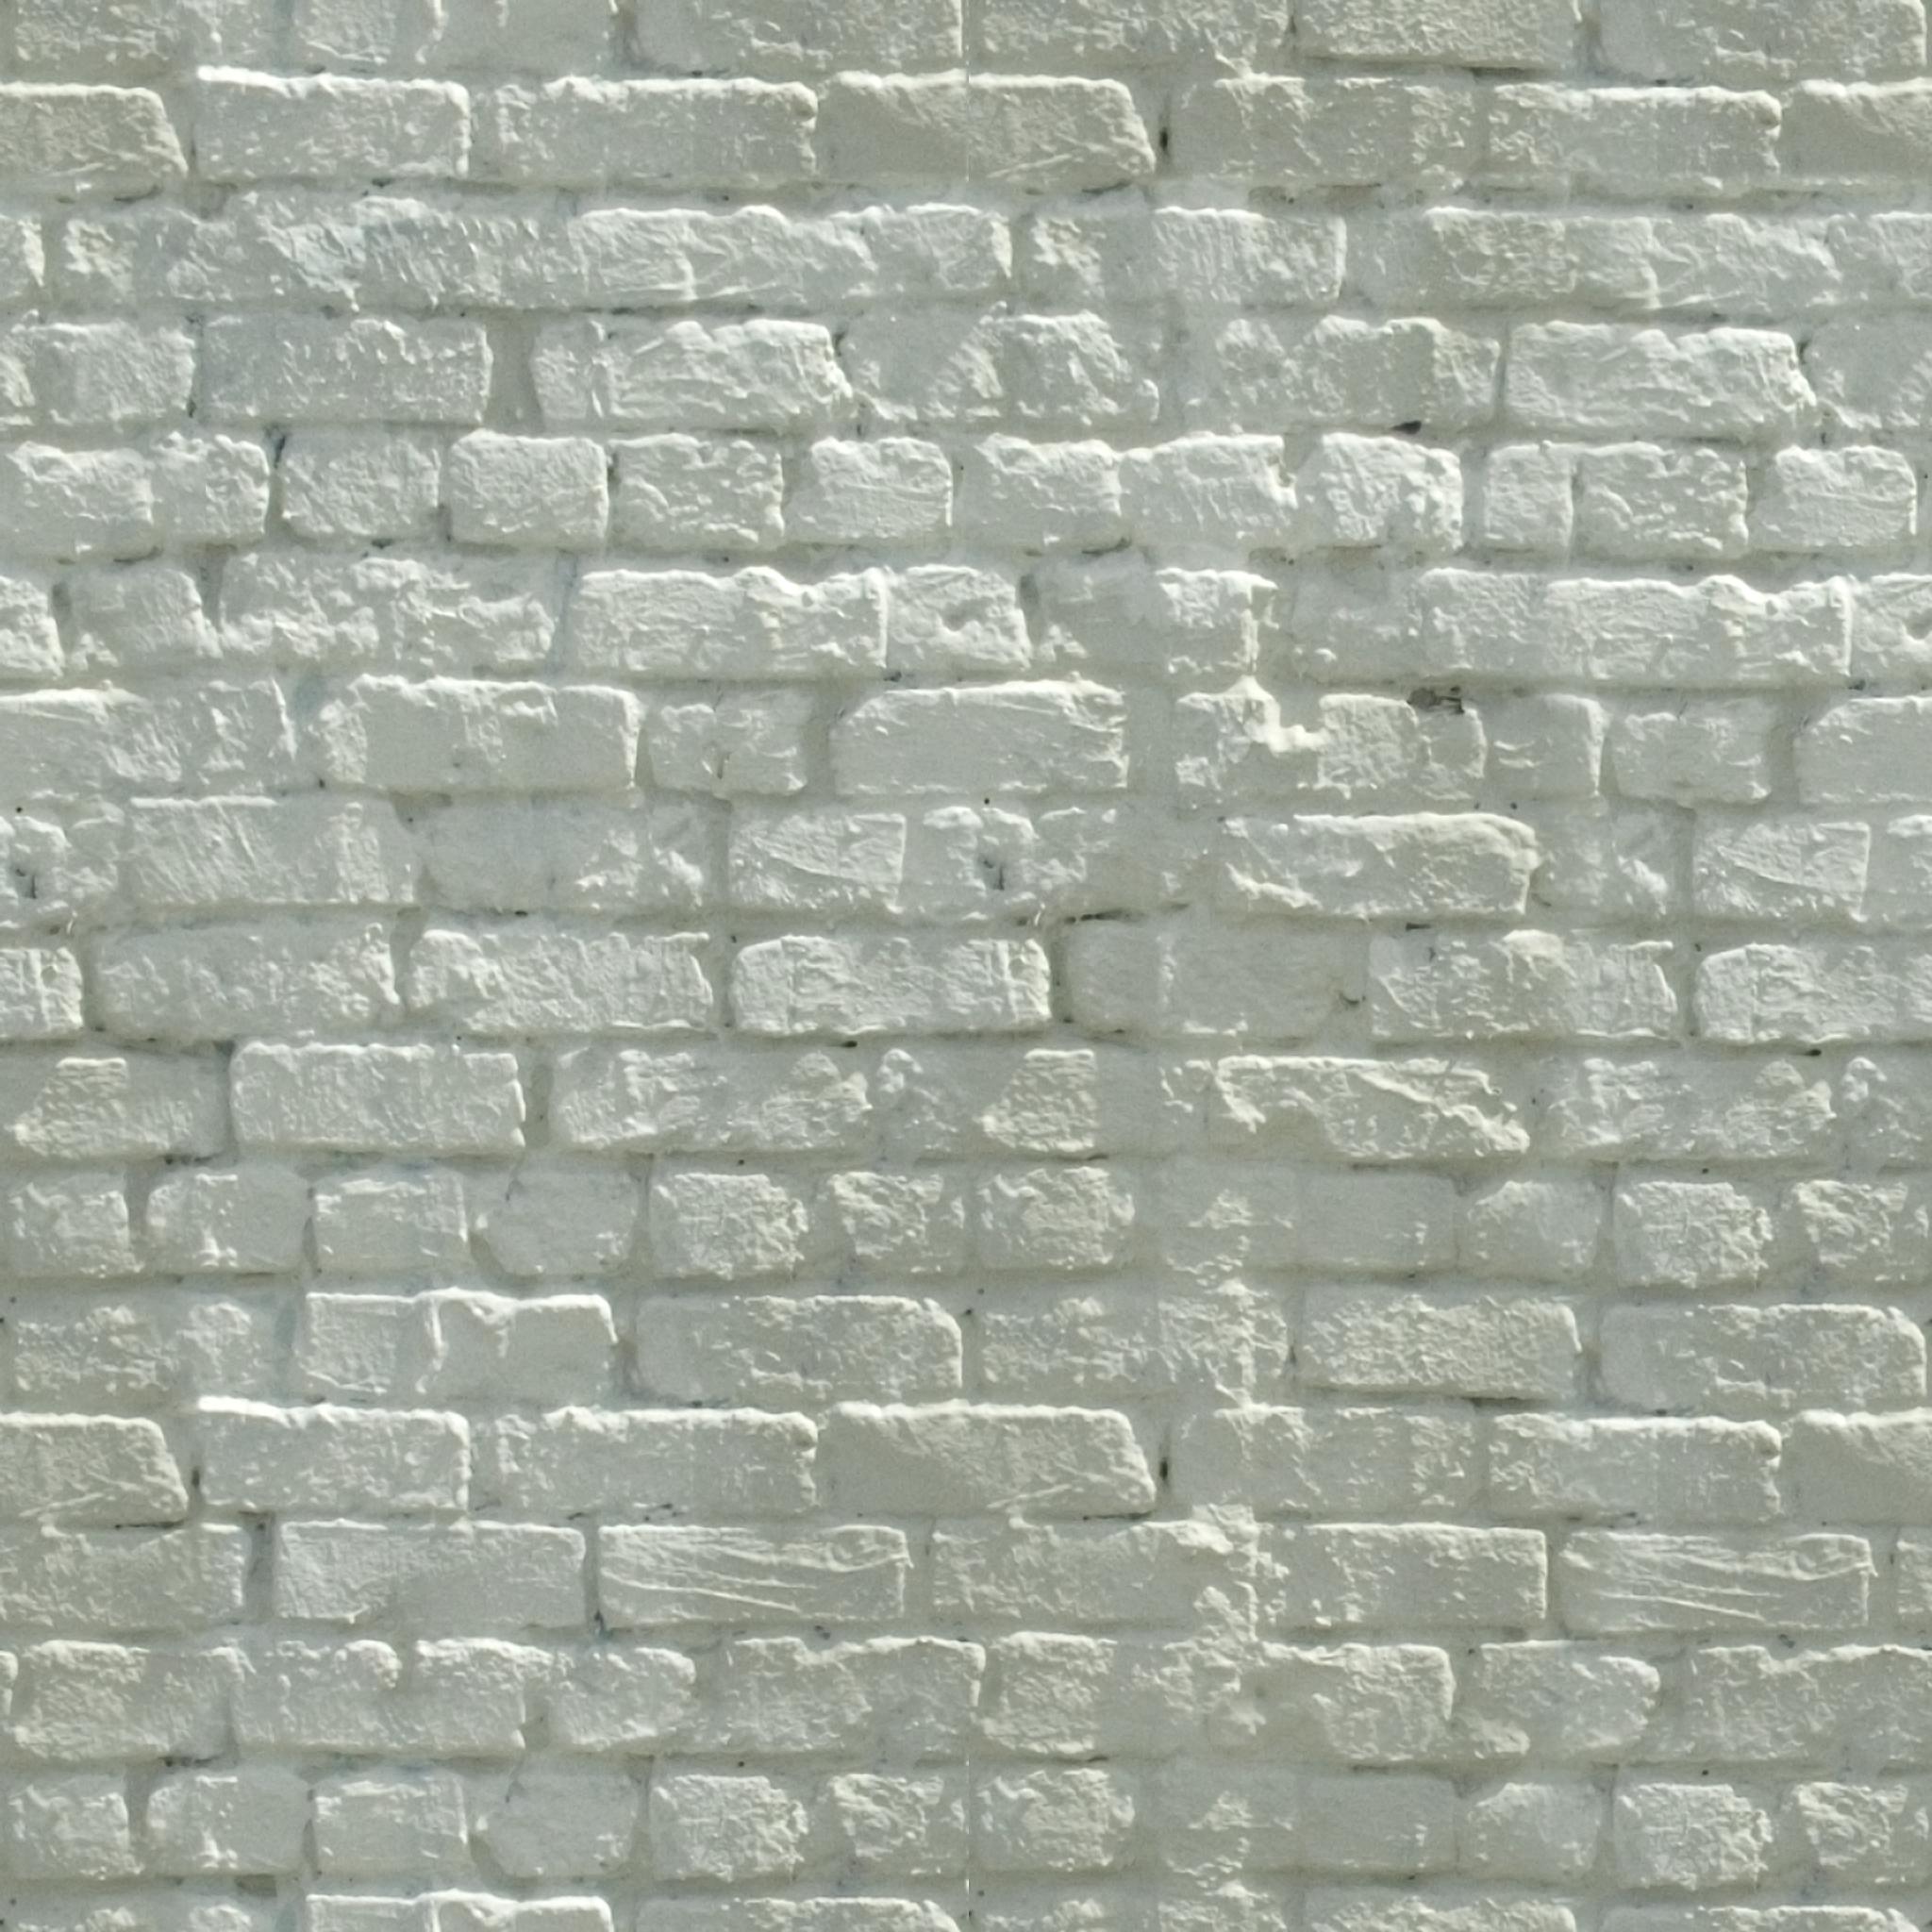 Babylon Tower Brick.jpg